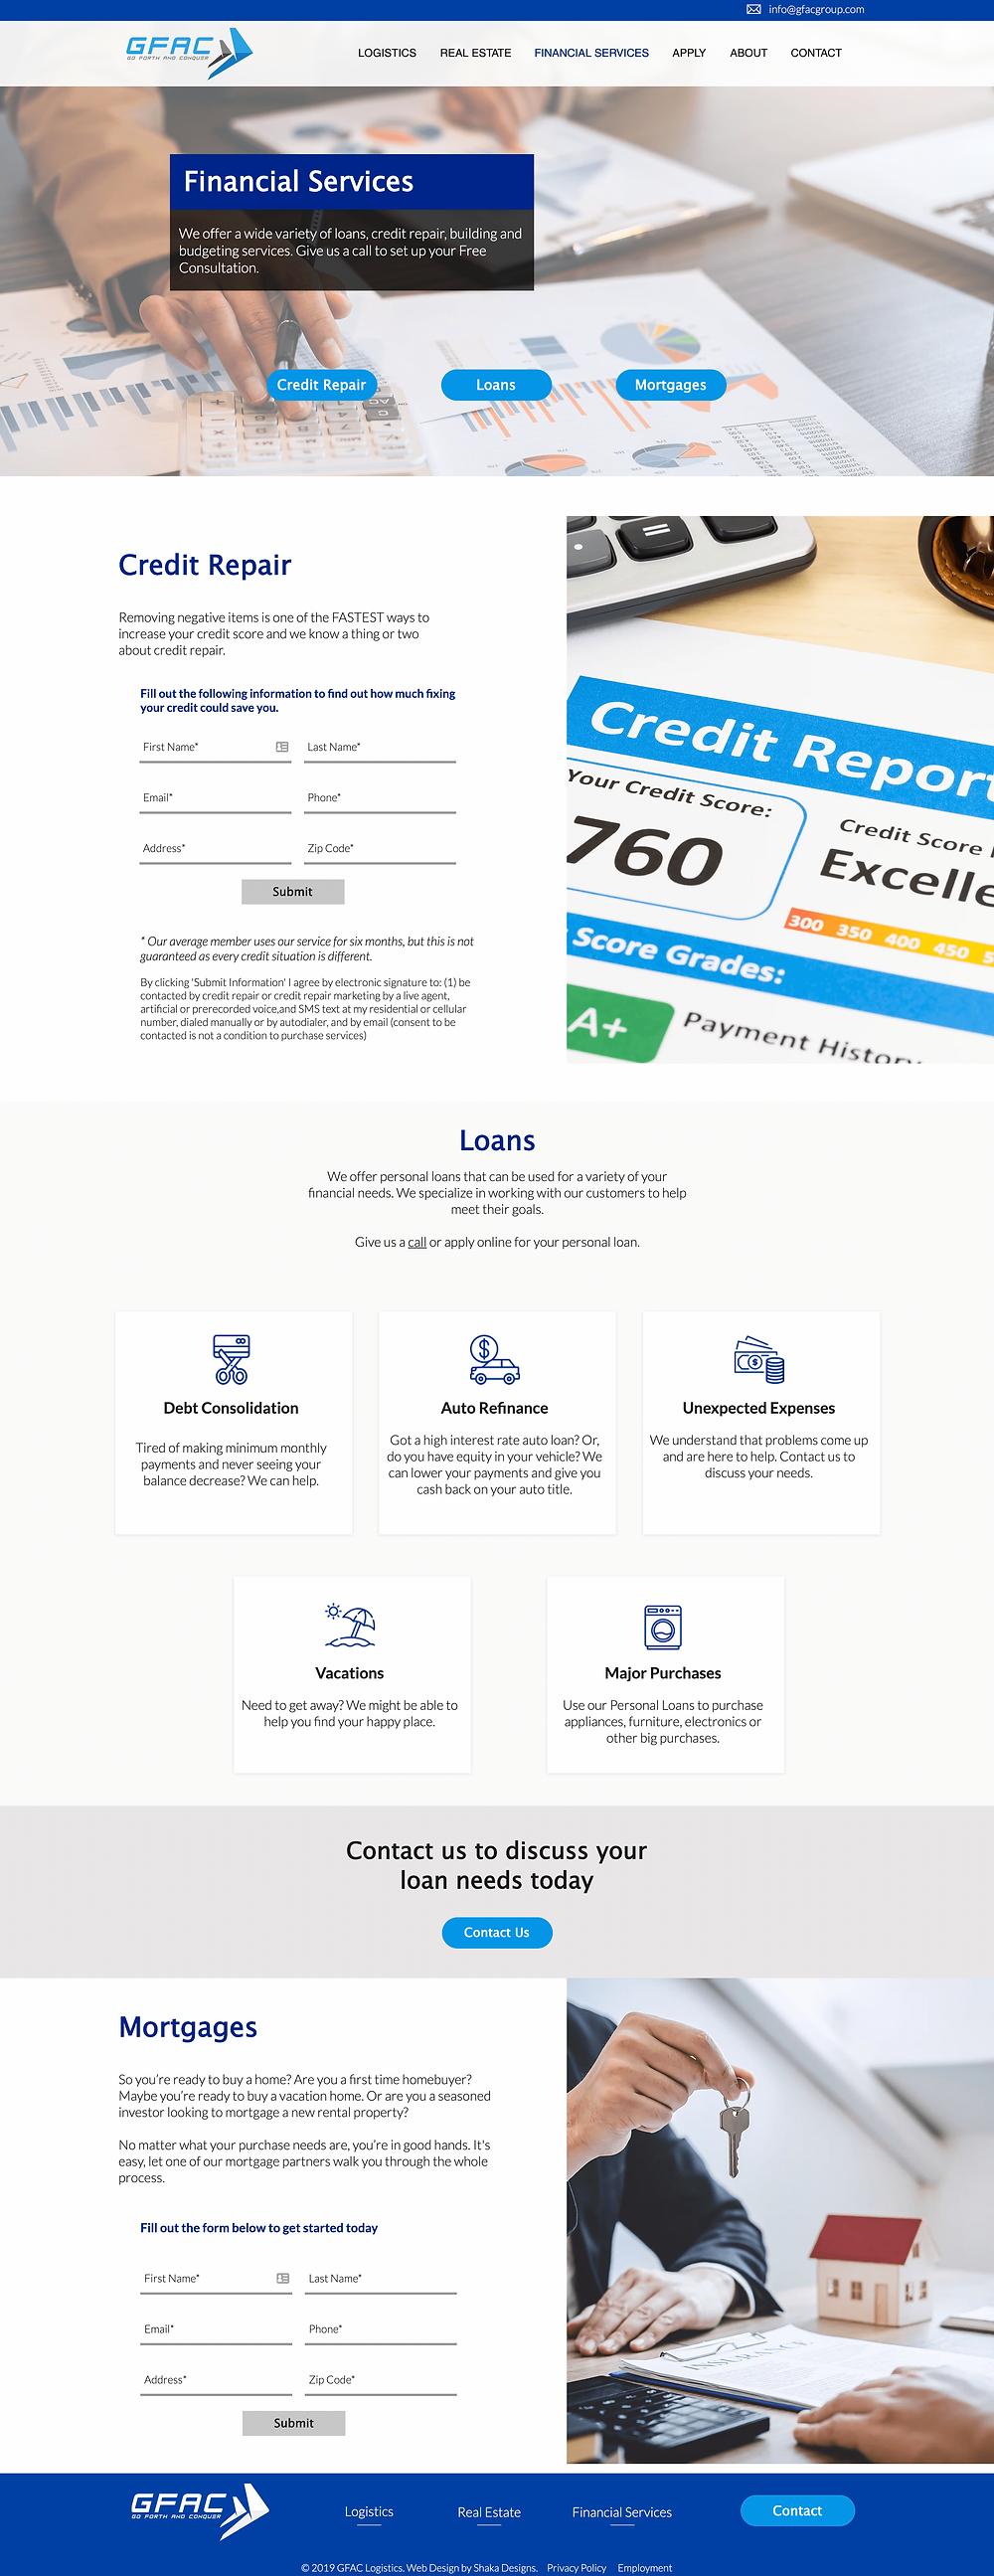 GFAC Logistics website